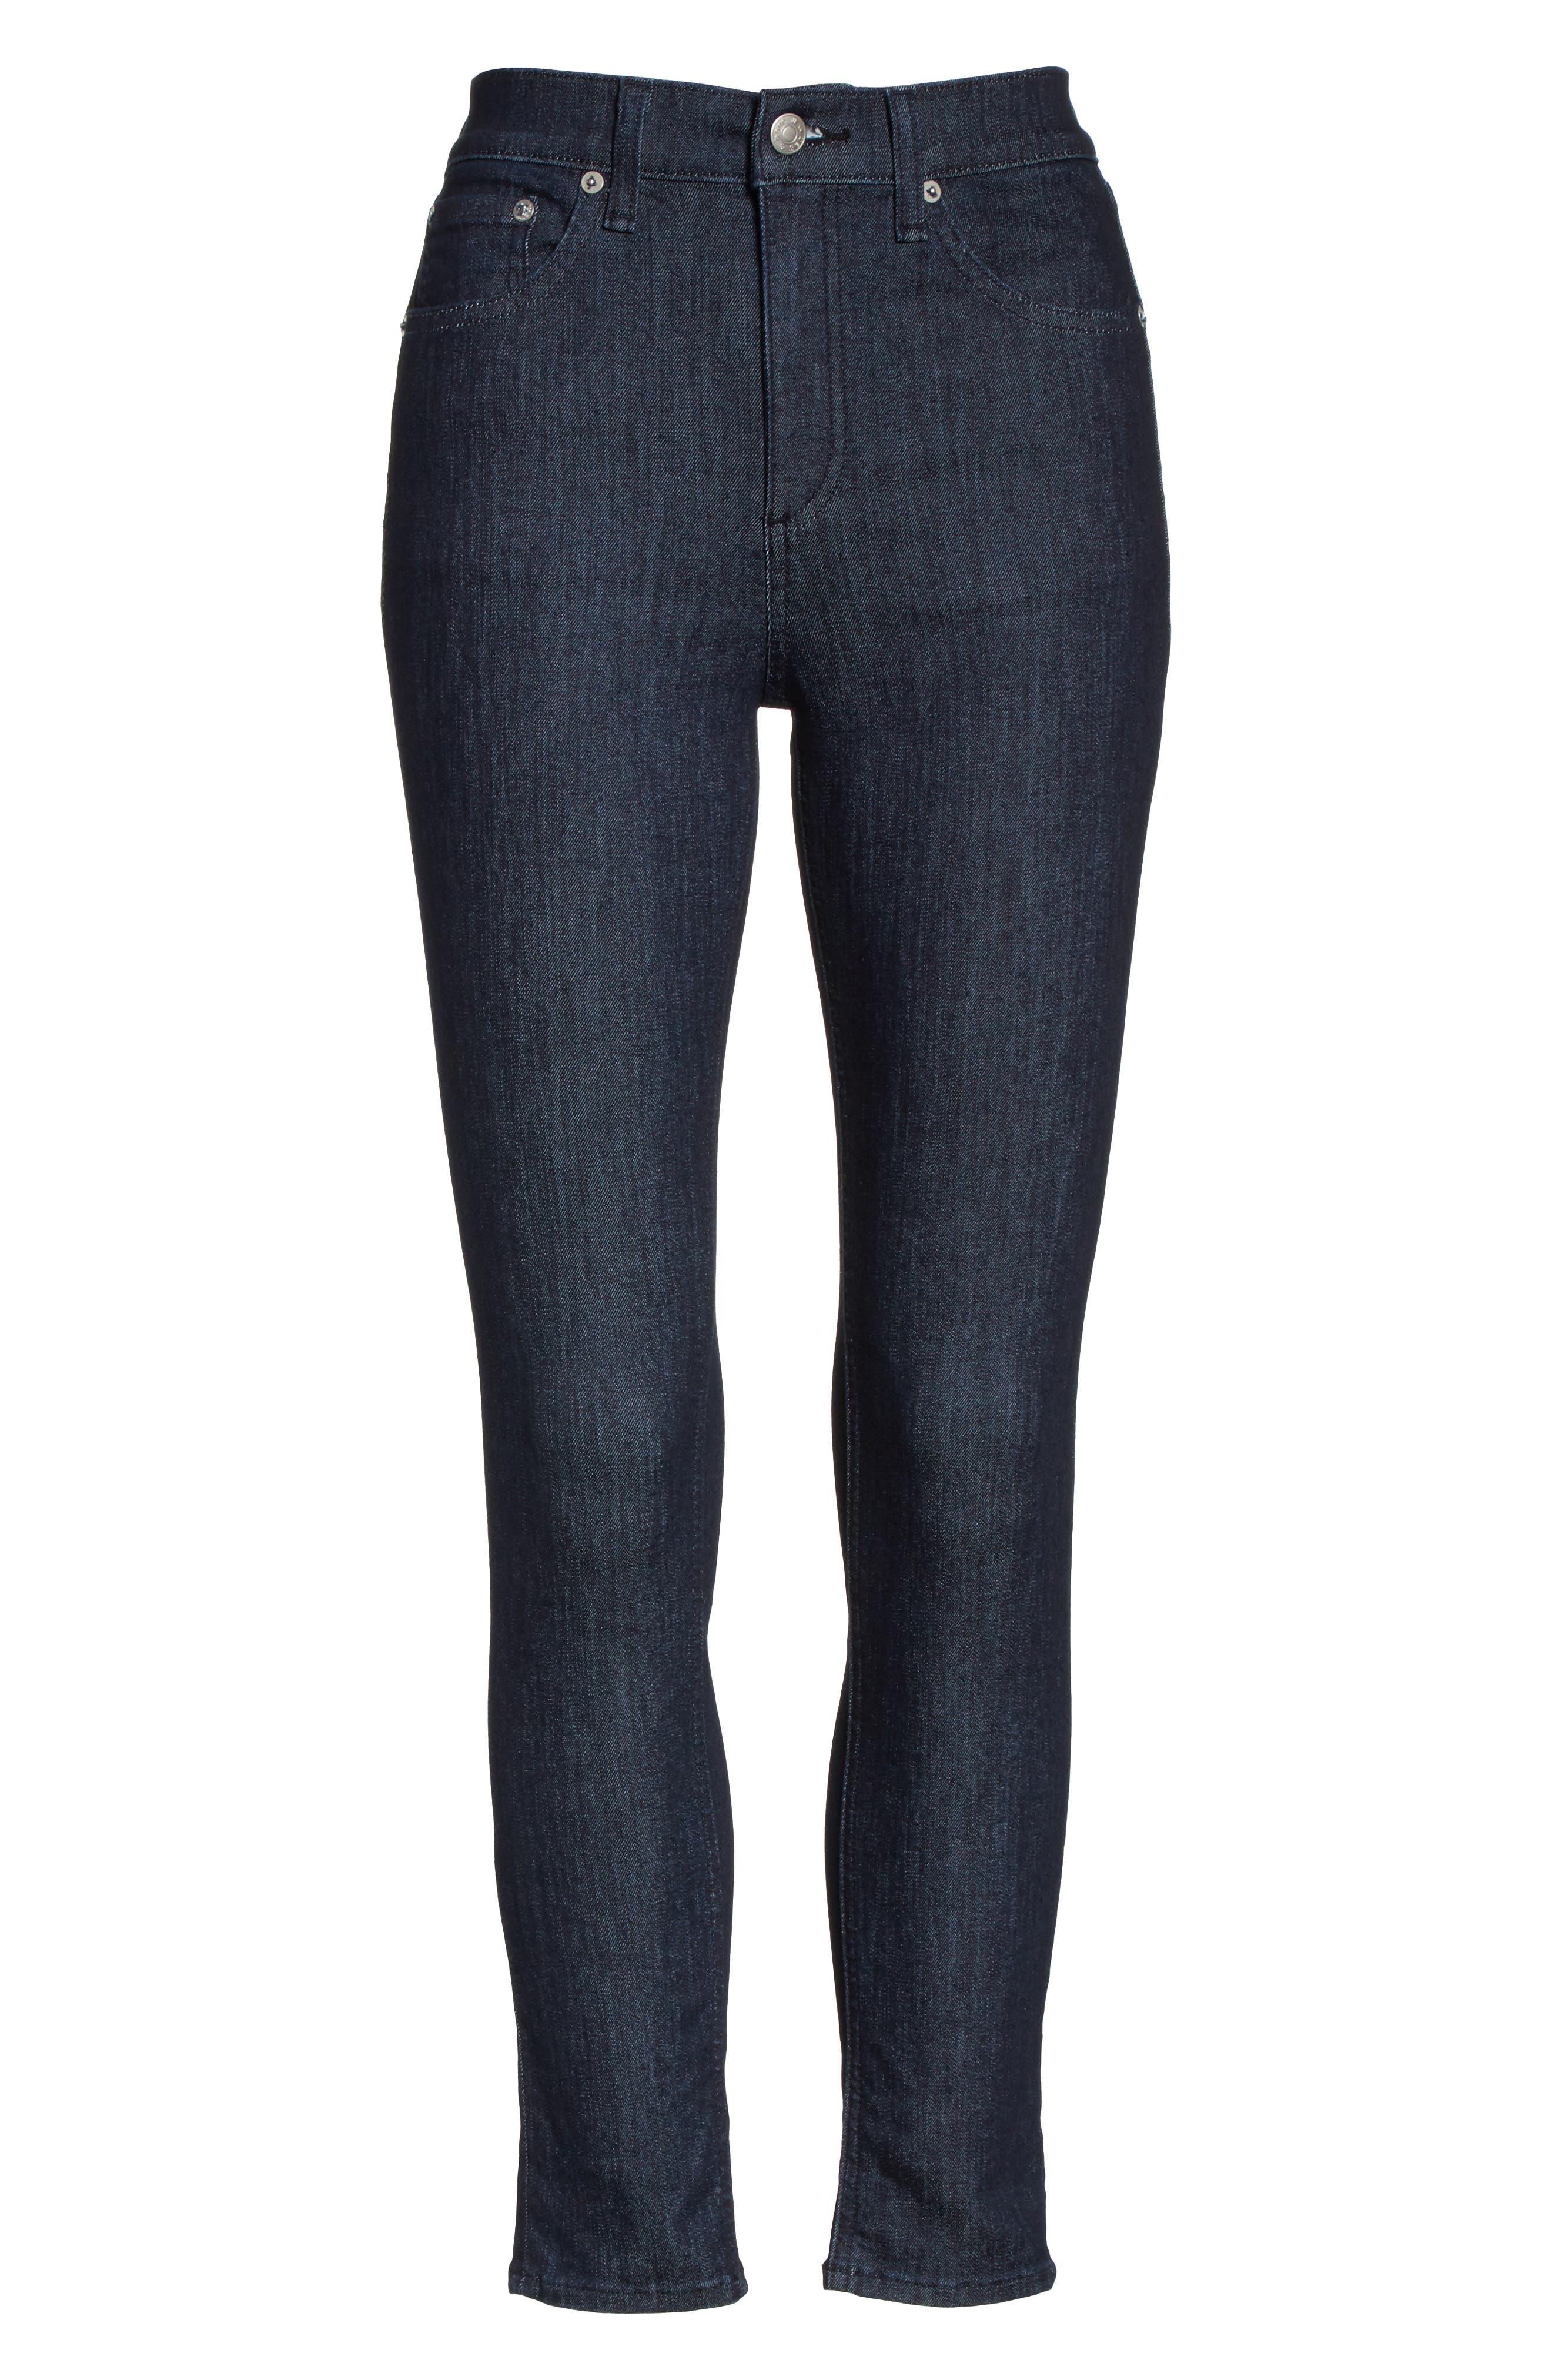 RAG & BONE, High Waist Skinny Jeans, Alternate thumbnail 7, color, INDIGO